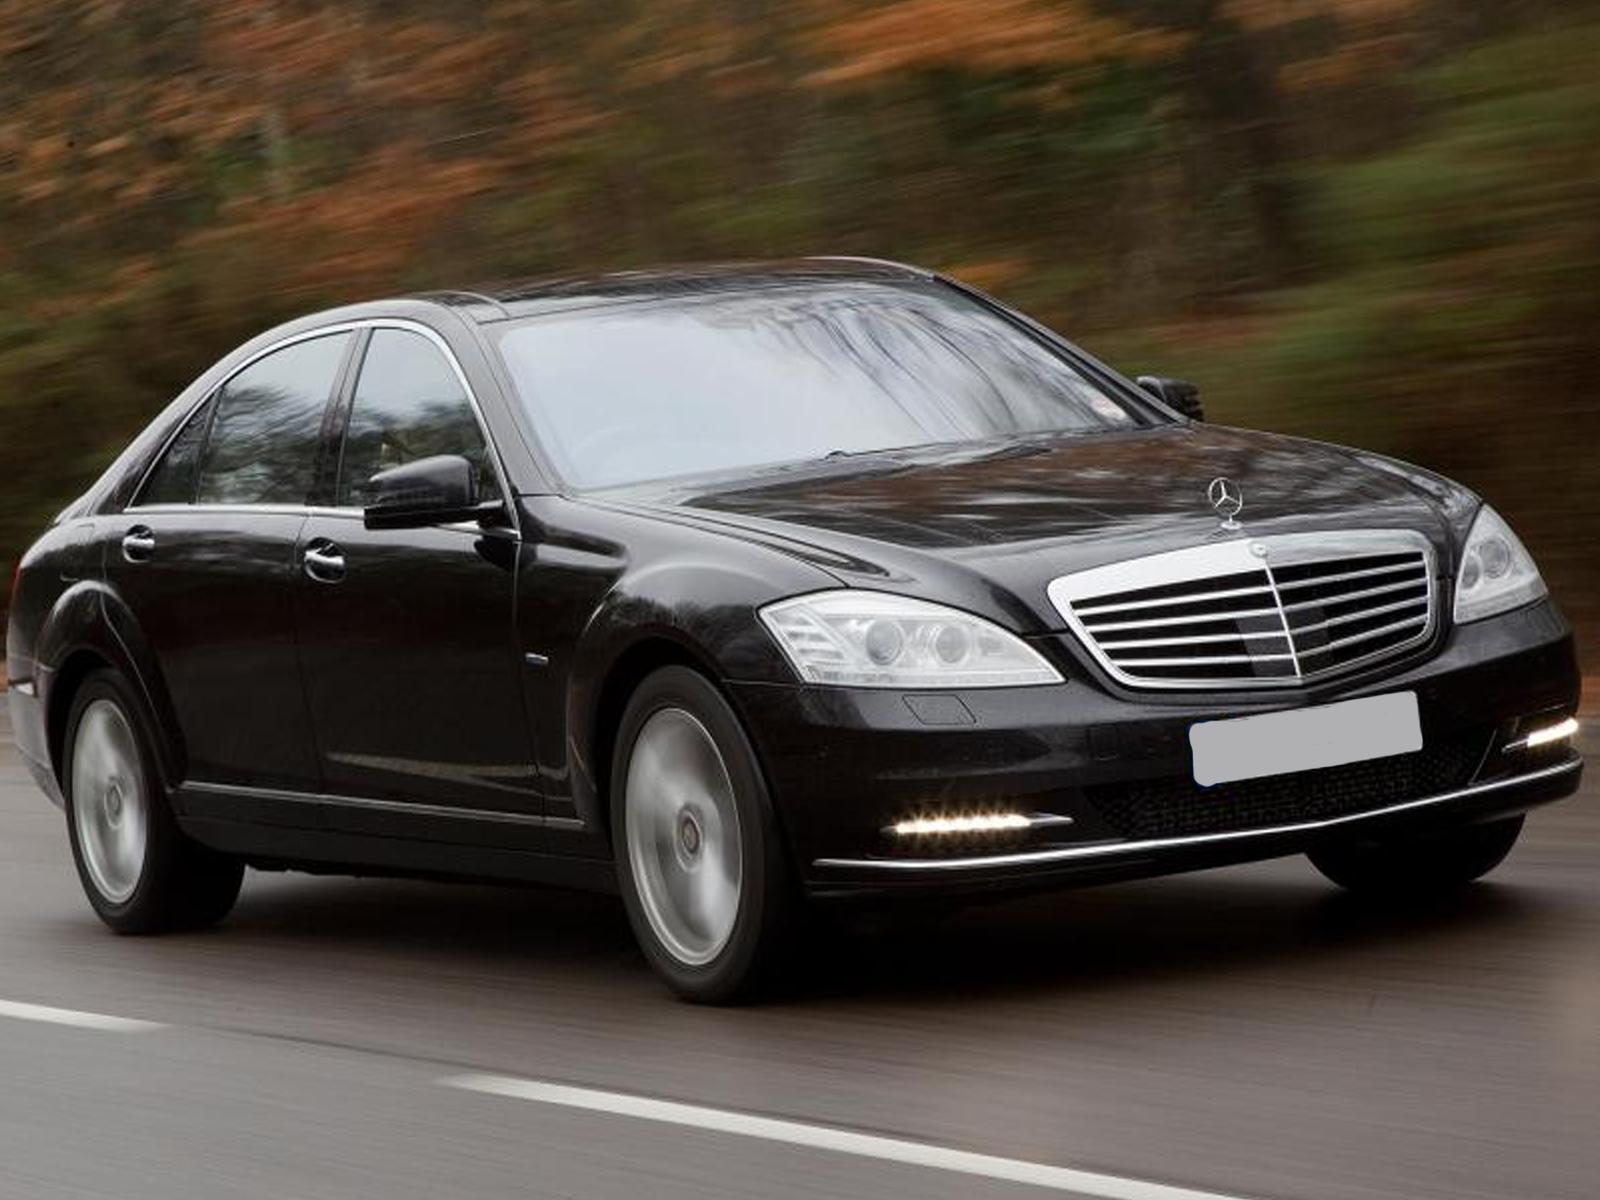 Luxury Mercedes S Class Chauffeur Services Ireland